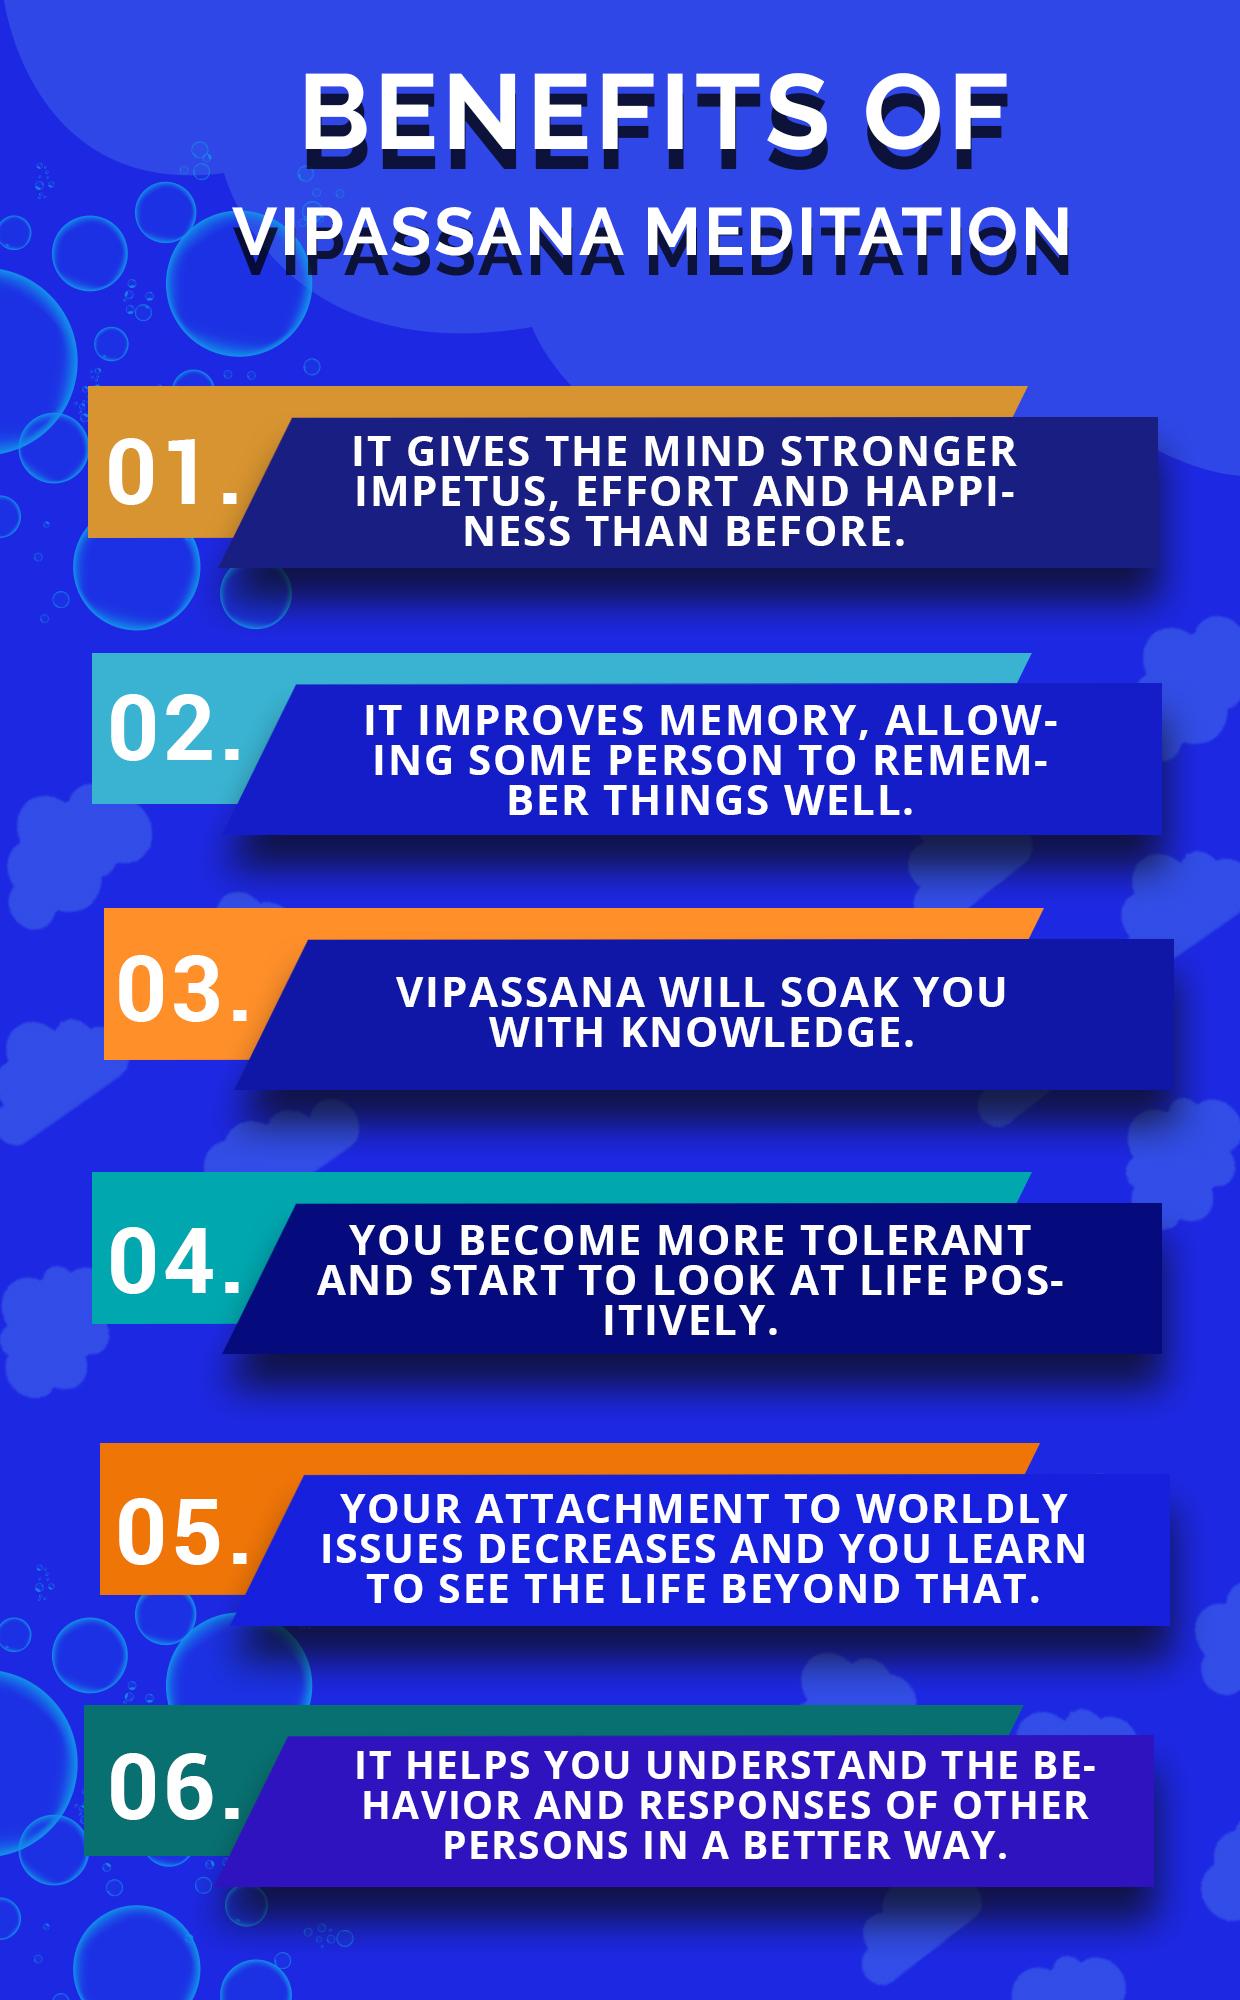 vipassana-meditation-benefits-infographics